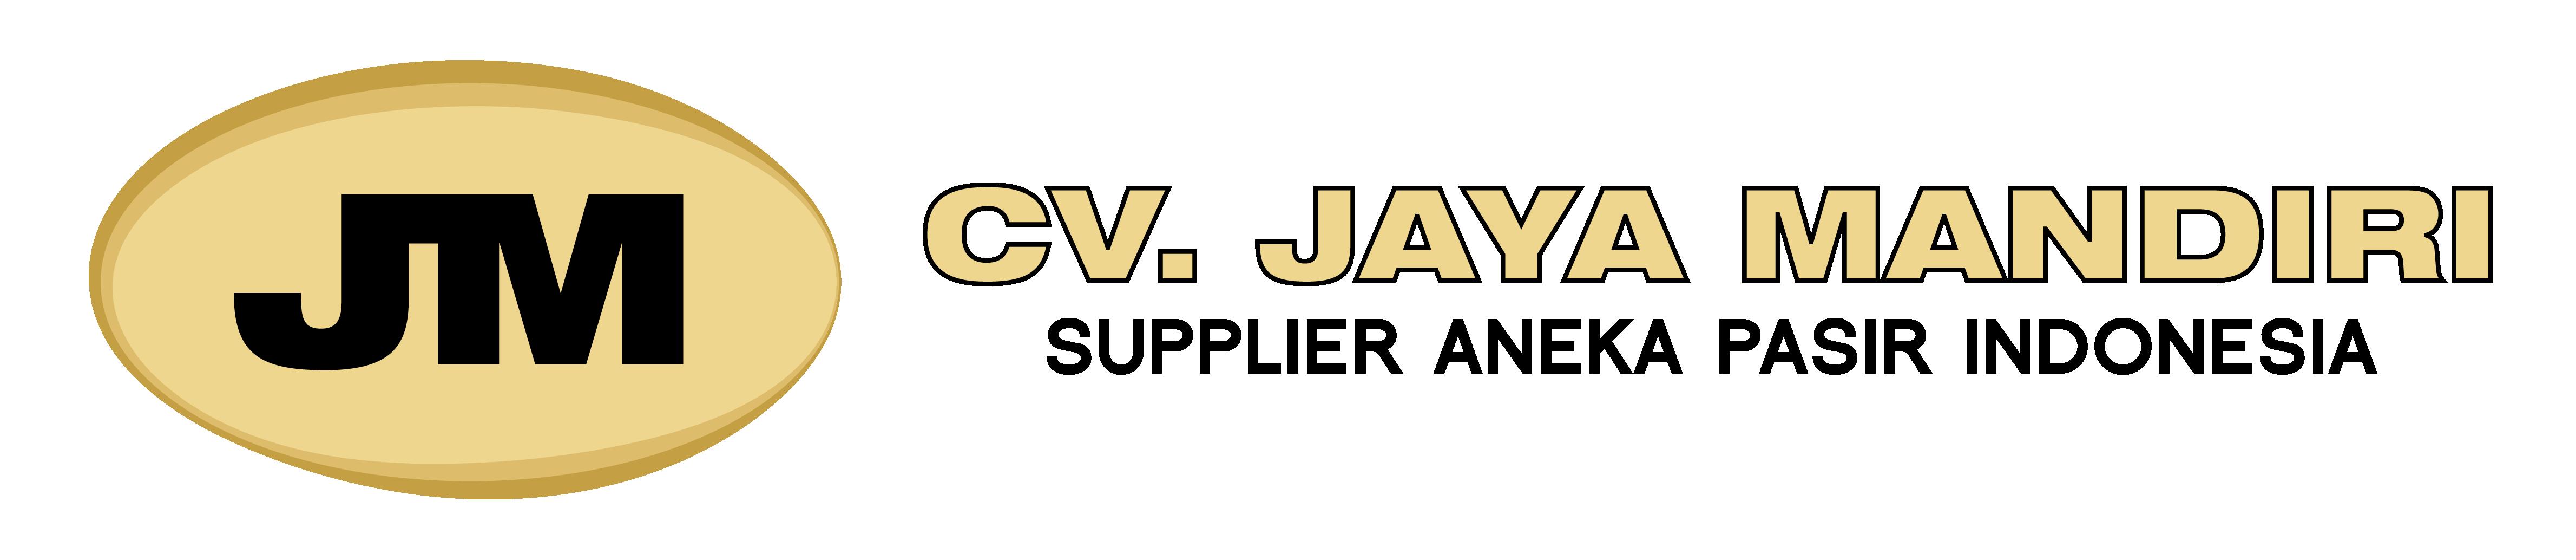 CV Jaya Mandiri